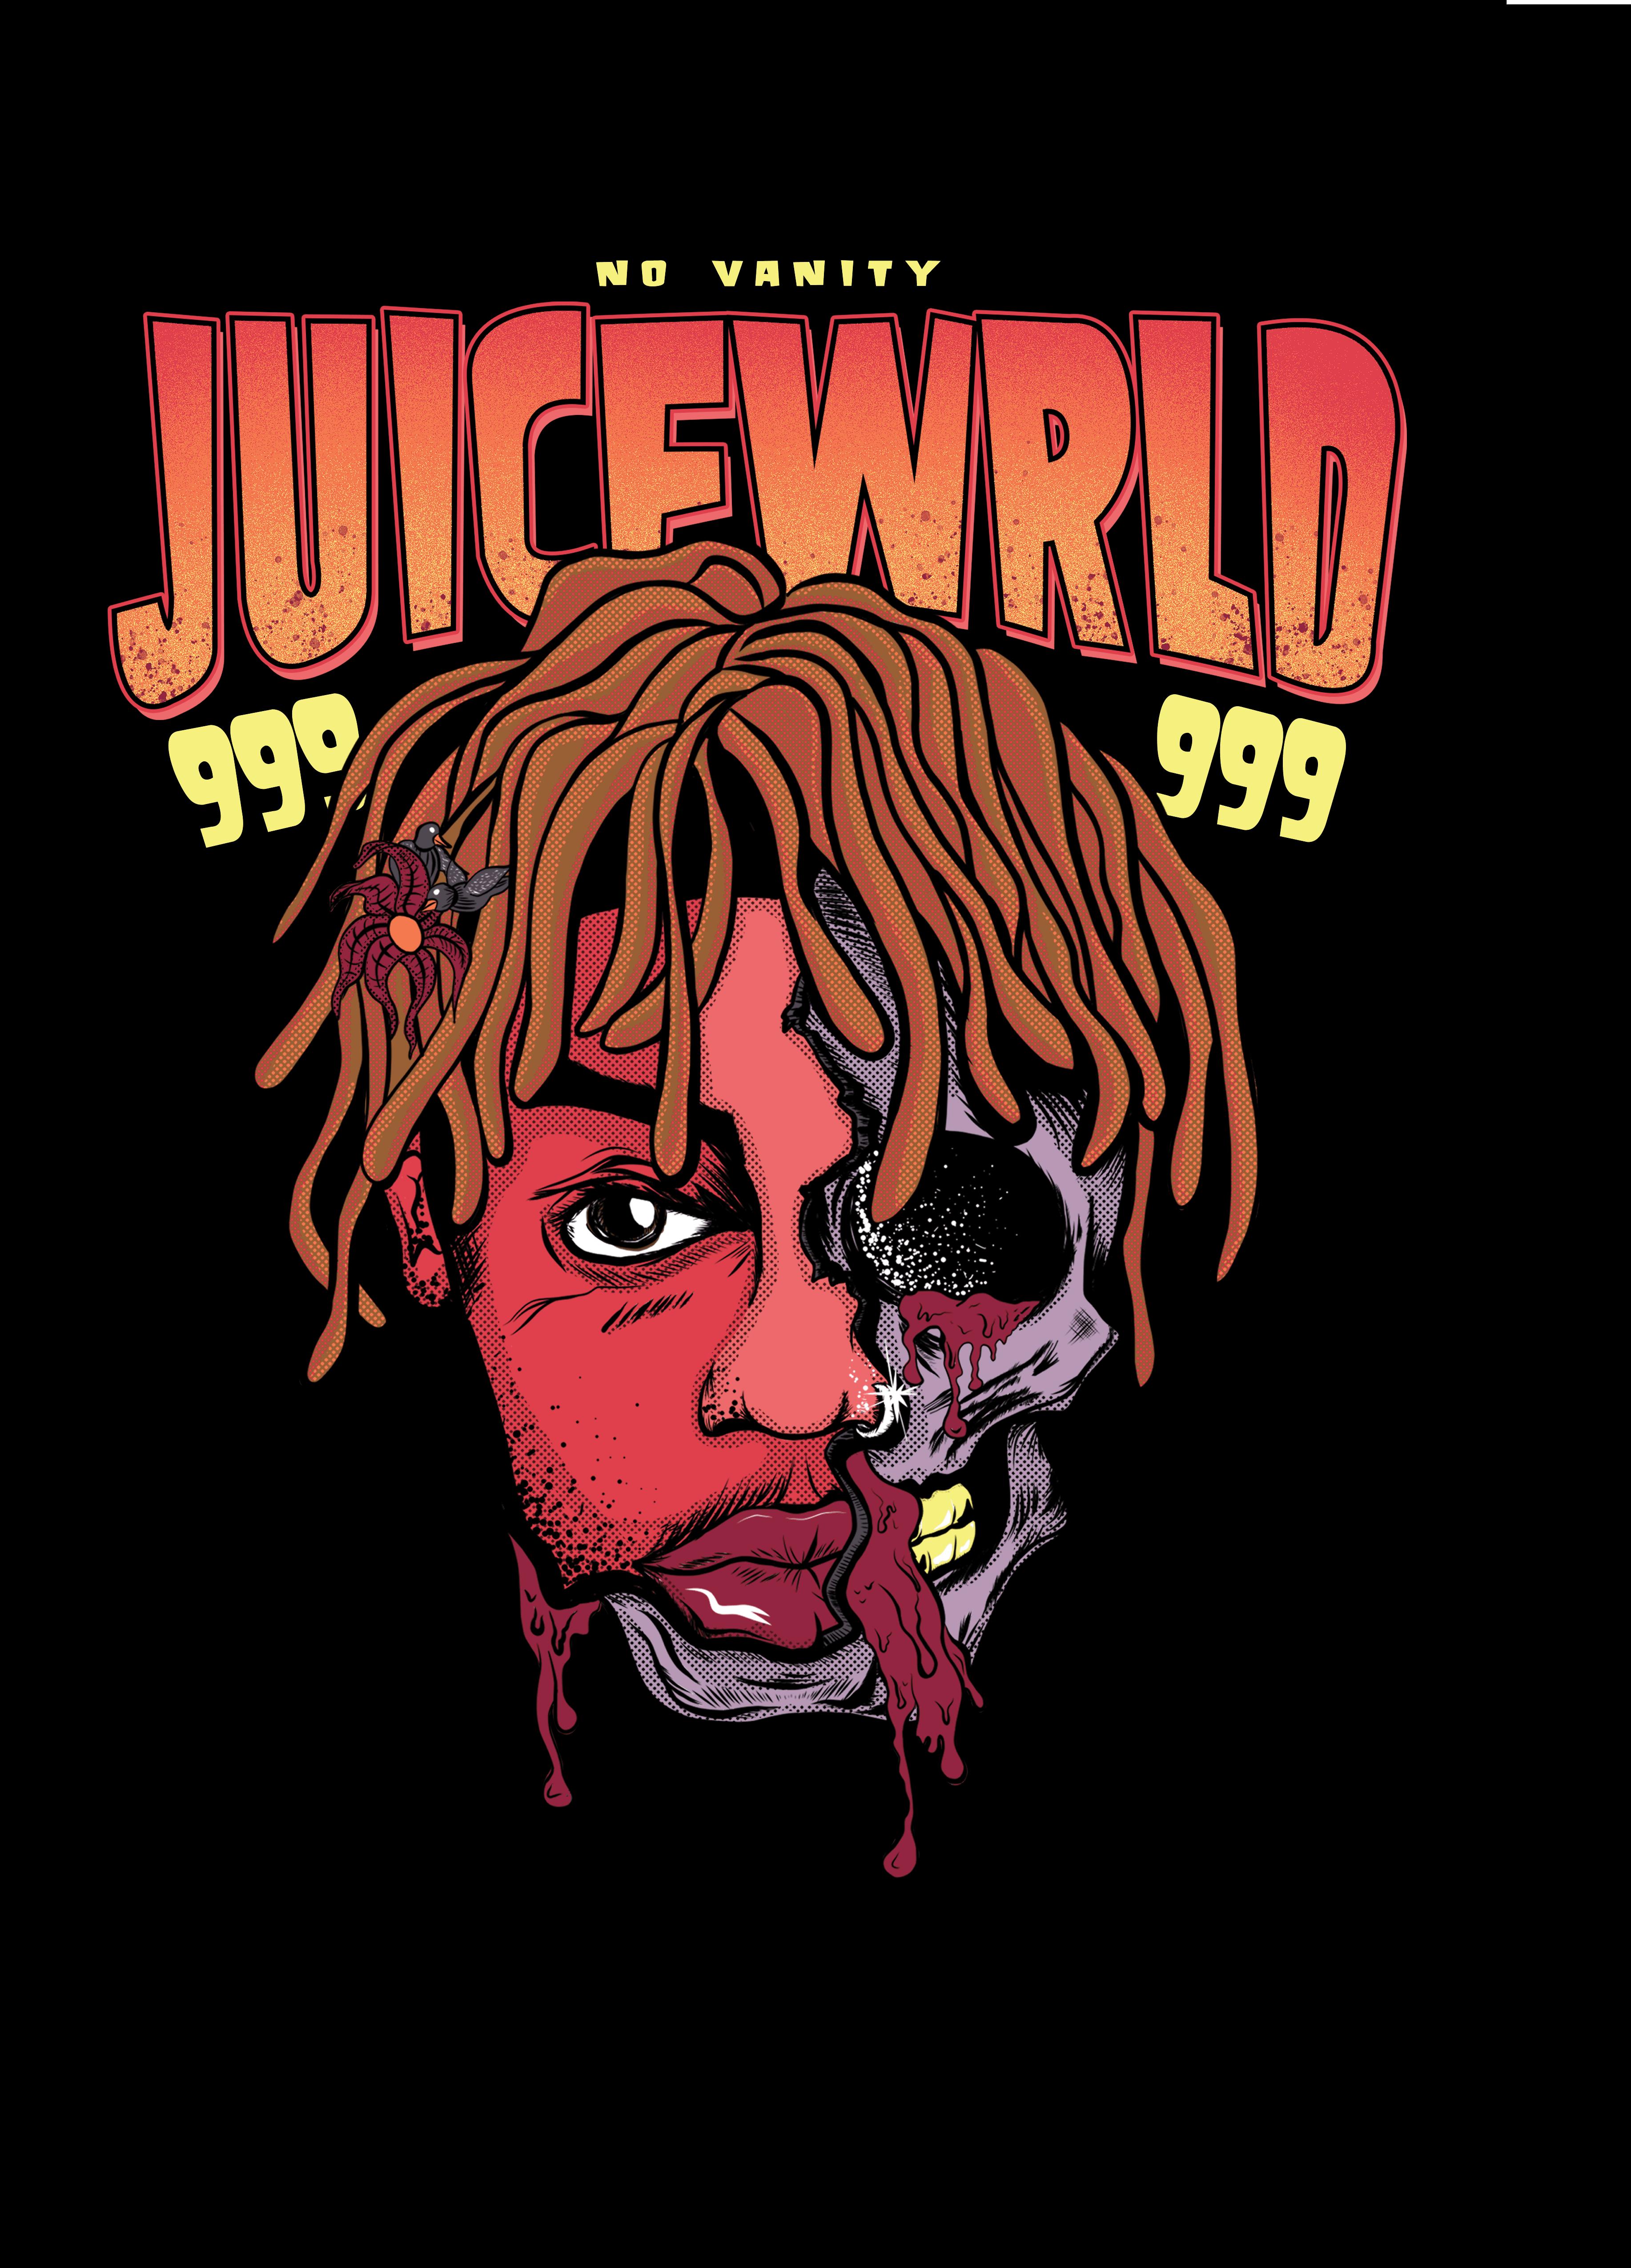 Juice Wrld Rip Wallpapers Top Free Juice Wrld Rip Backgrounds